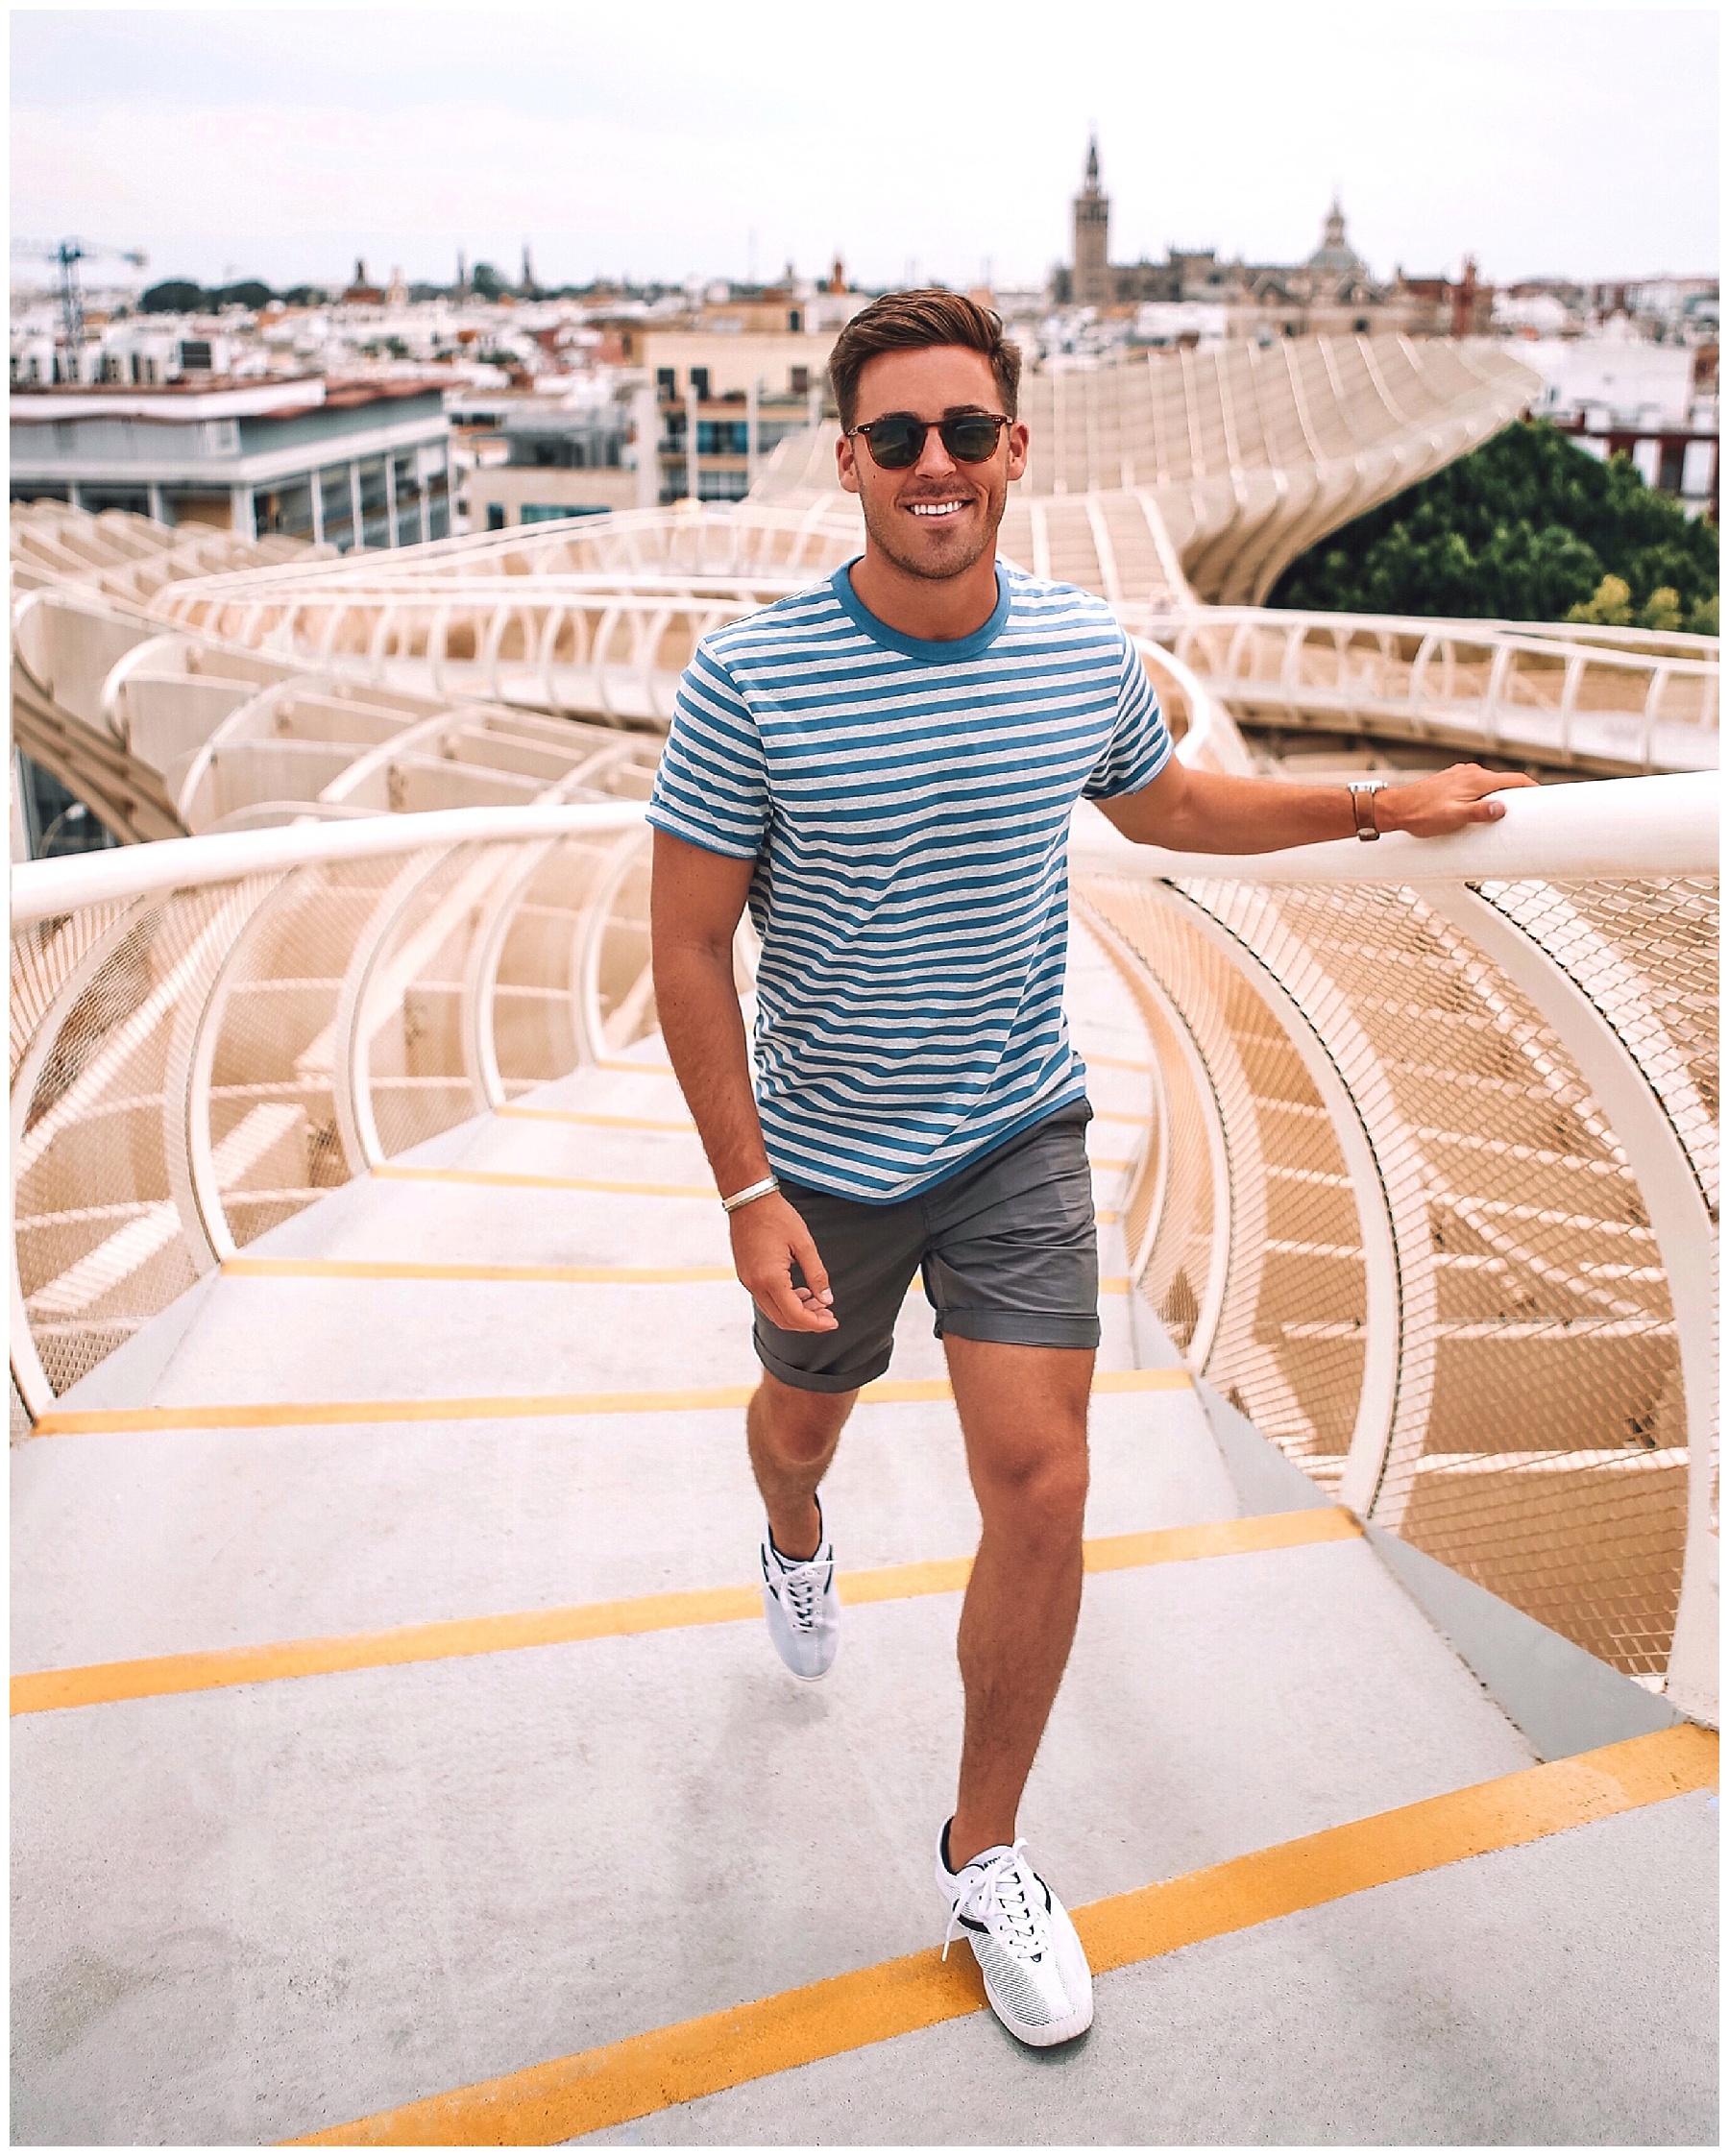 John Philp Thompson Menswear Travel Blogger Influencer Sneaker